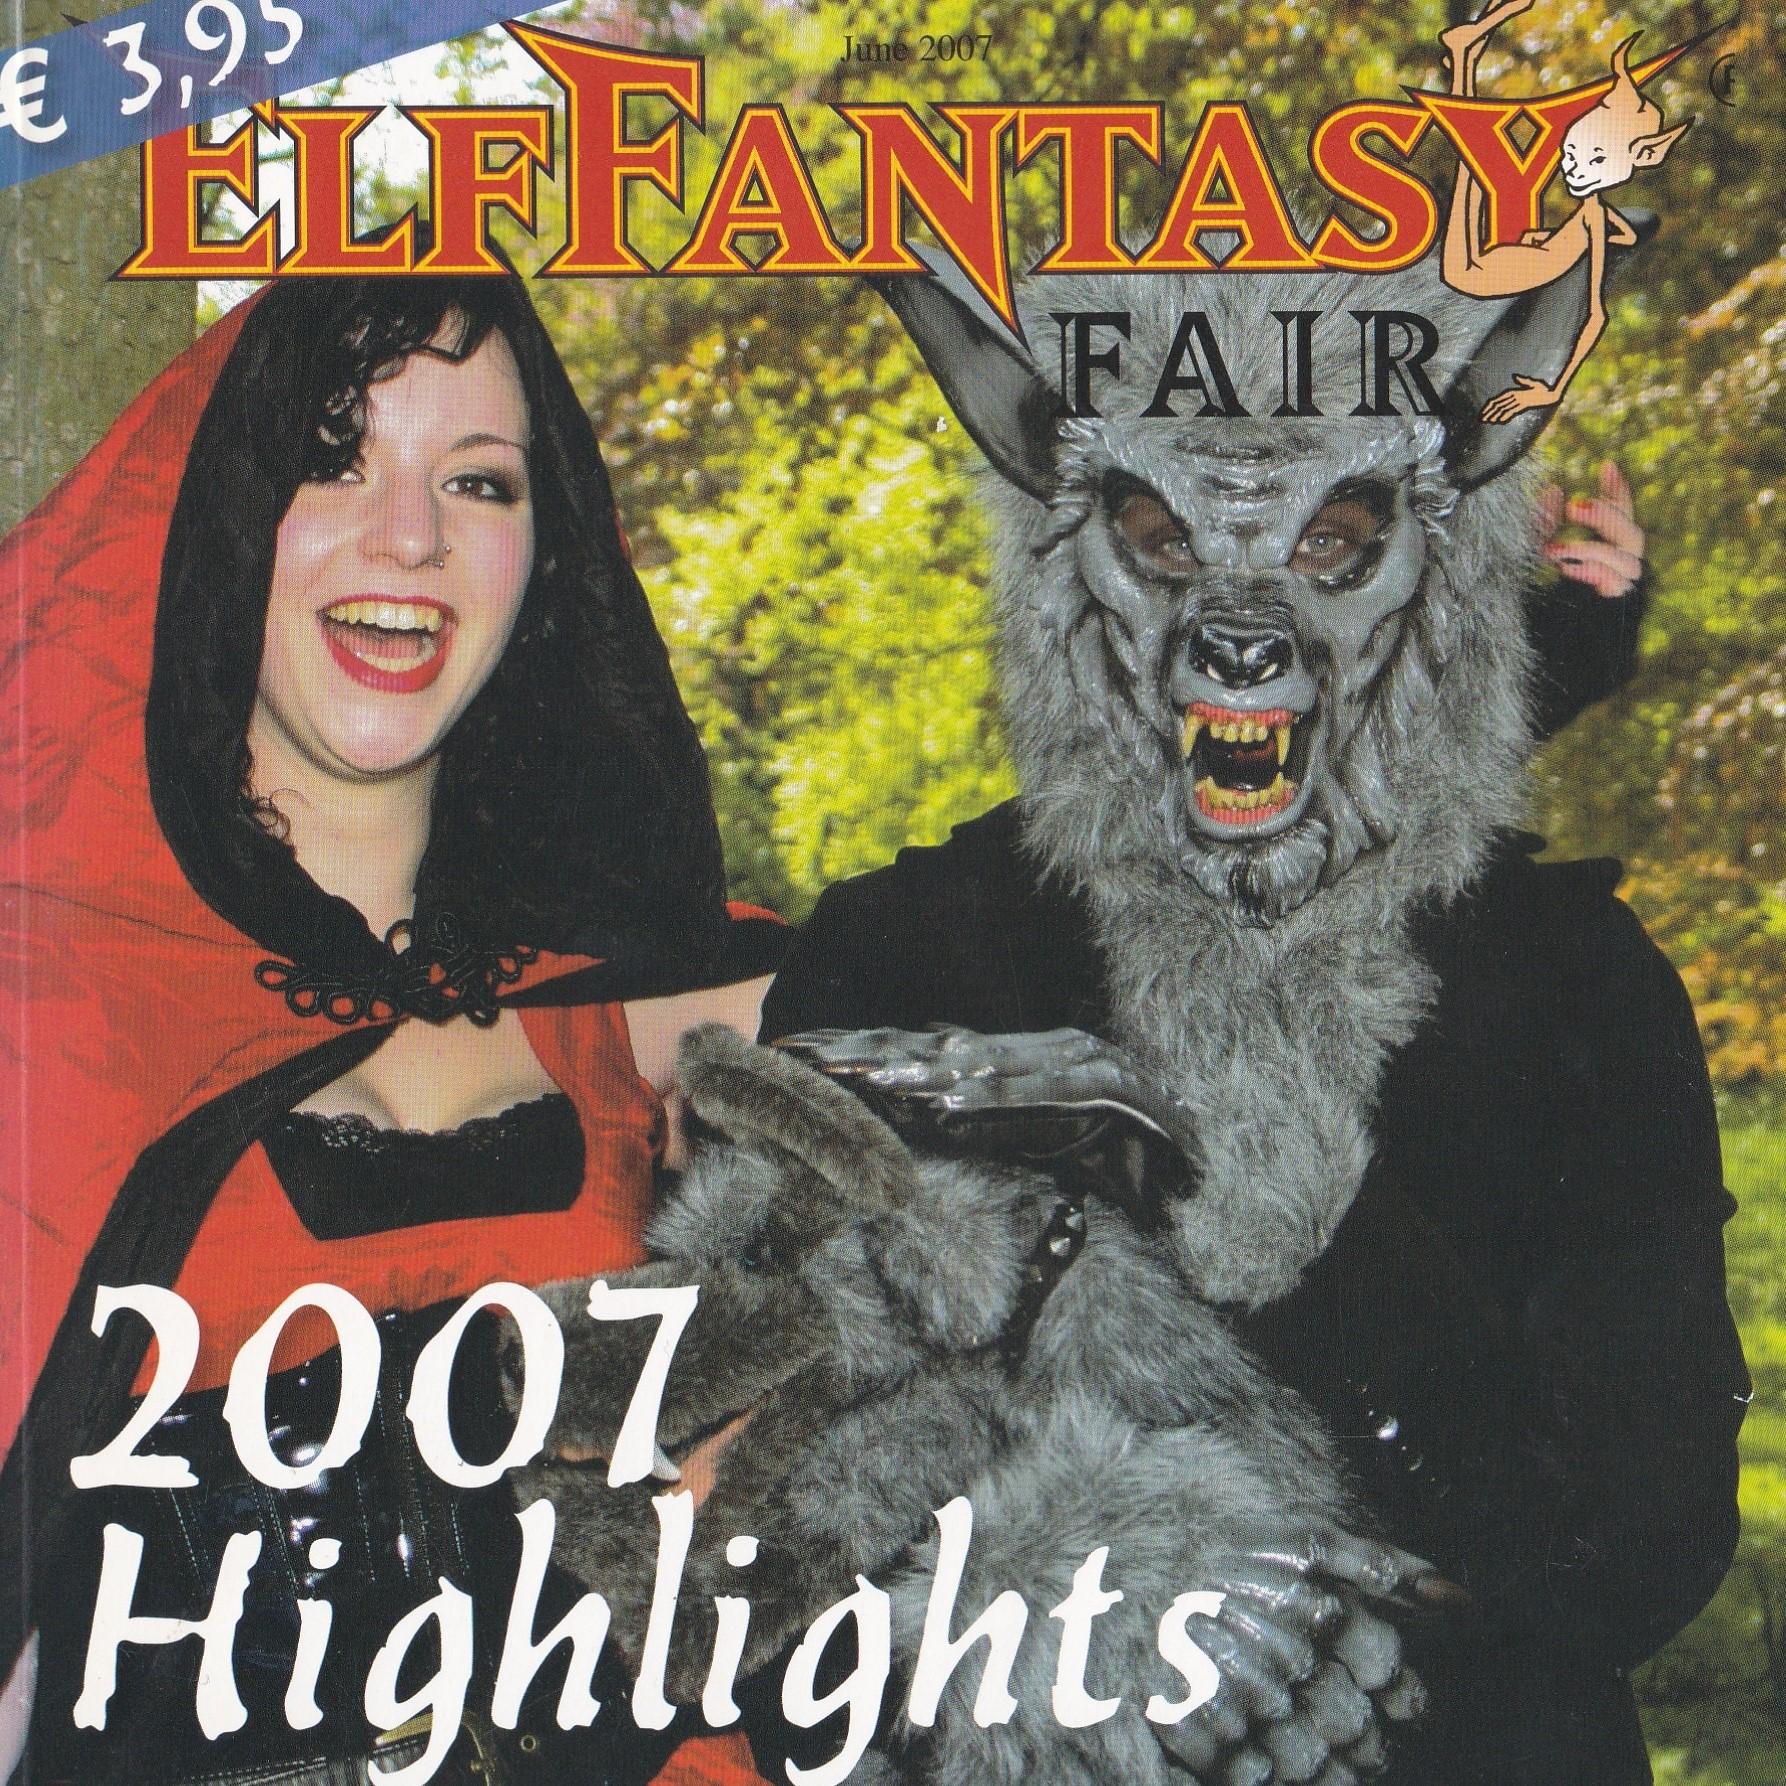 booklet Elf Fantasy Fair 2007 front vierkant artikelen